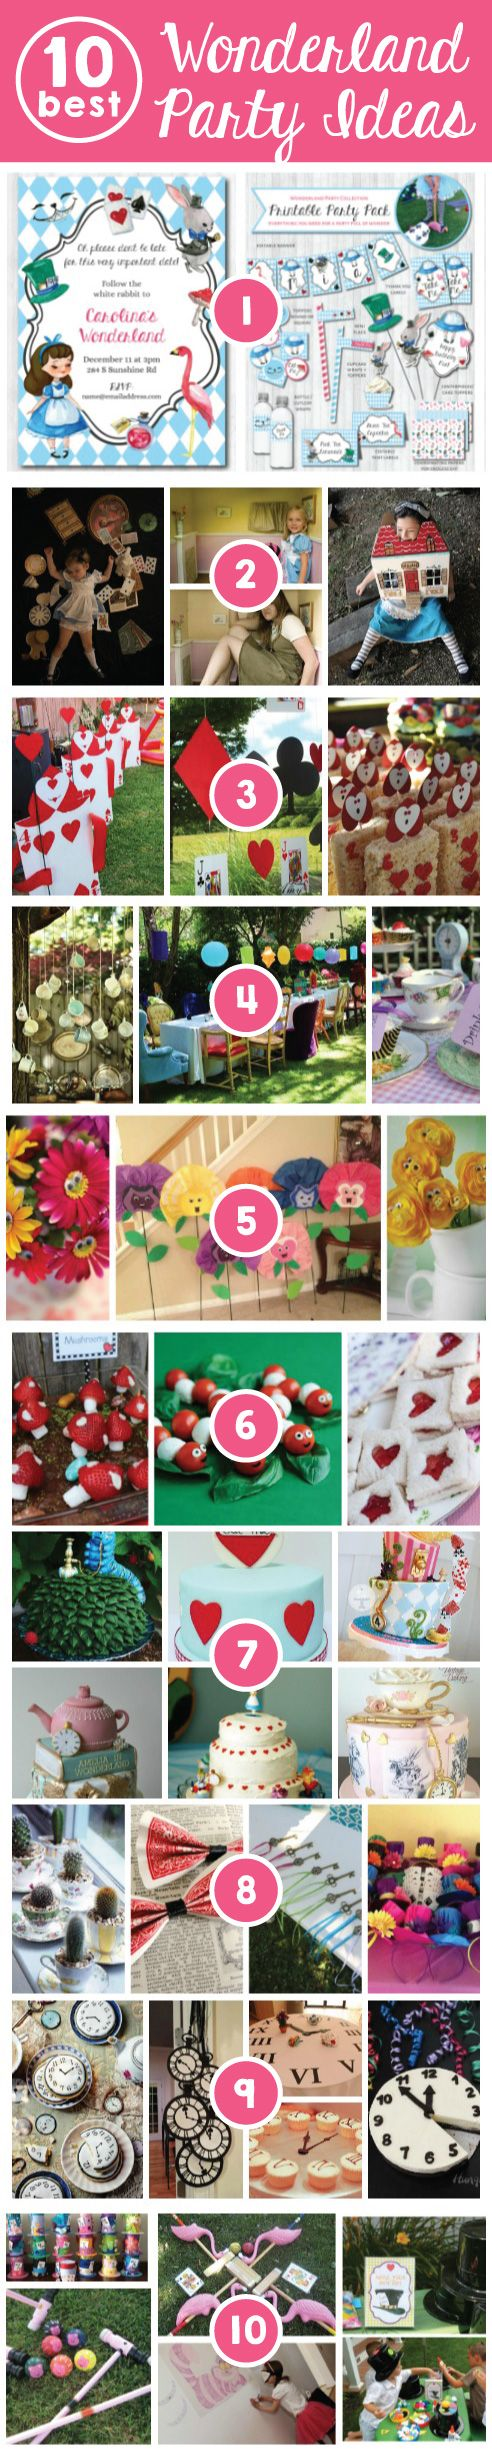 Alice in Wonderland Party ideas - Top 10 - original fun food decor favors games fun whimsical